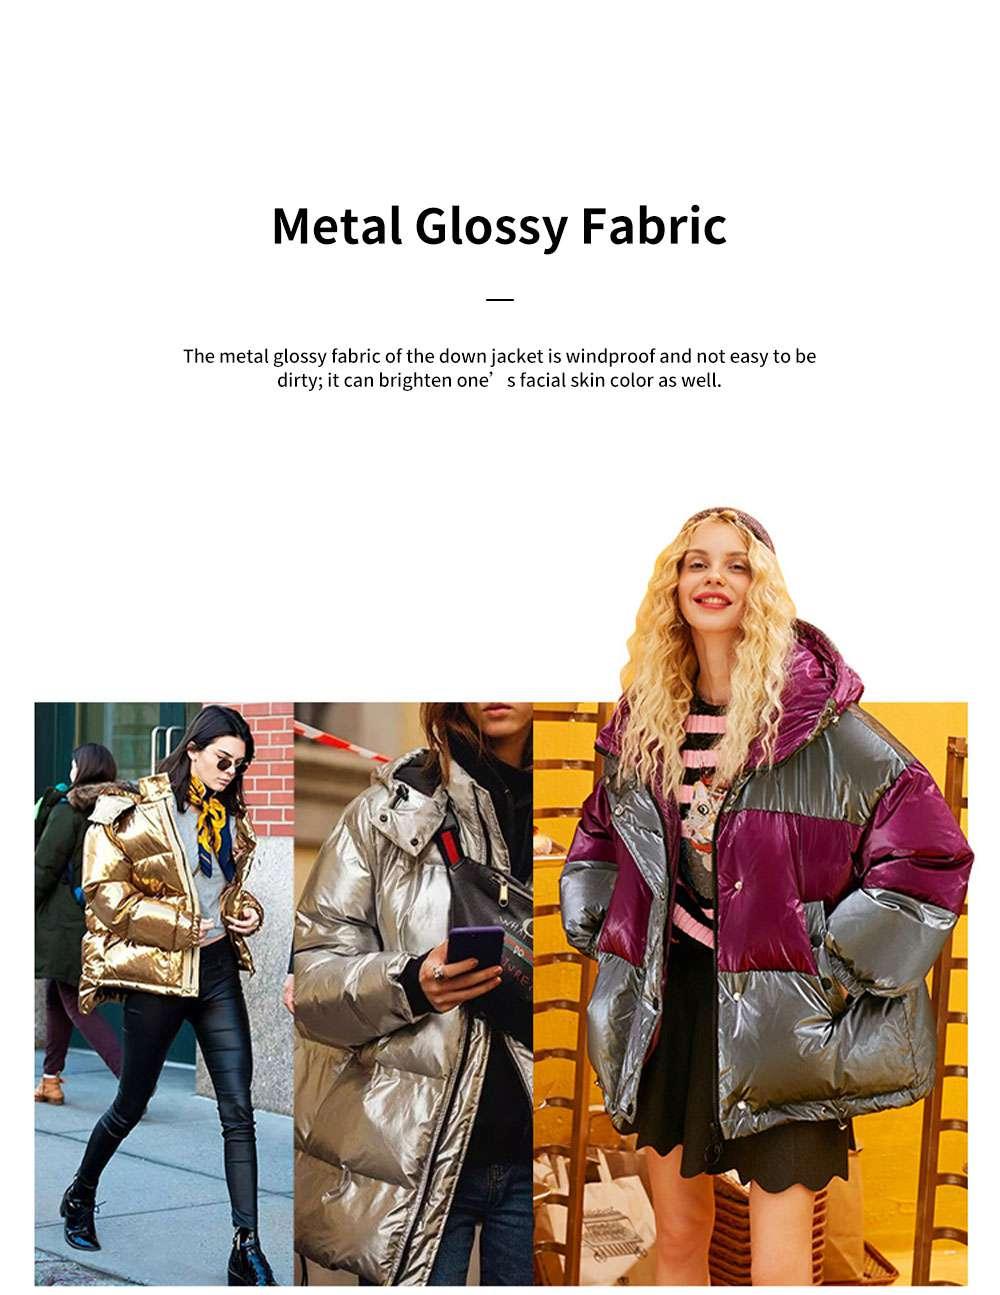 ELFSACK 2019 NEW Splicing Glossy Down Jacket for Women Winter Wear Loose Down Coat Fashion Down Jacket 1